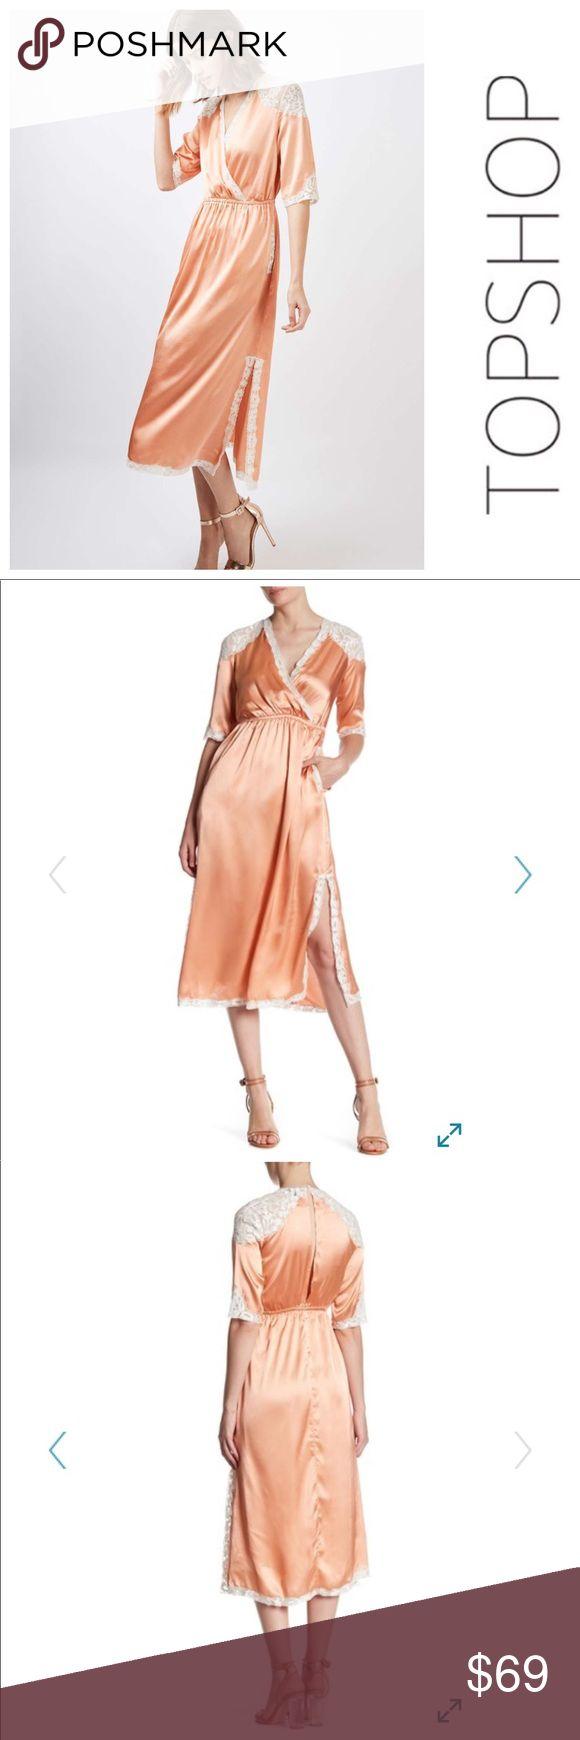 💕SALE💕NWT Topshop Lace Insert Satin Dress Gorgeous 💕NWT Topshop Lace Insert Satin Dress Topshop Dresses